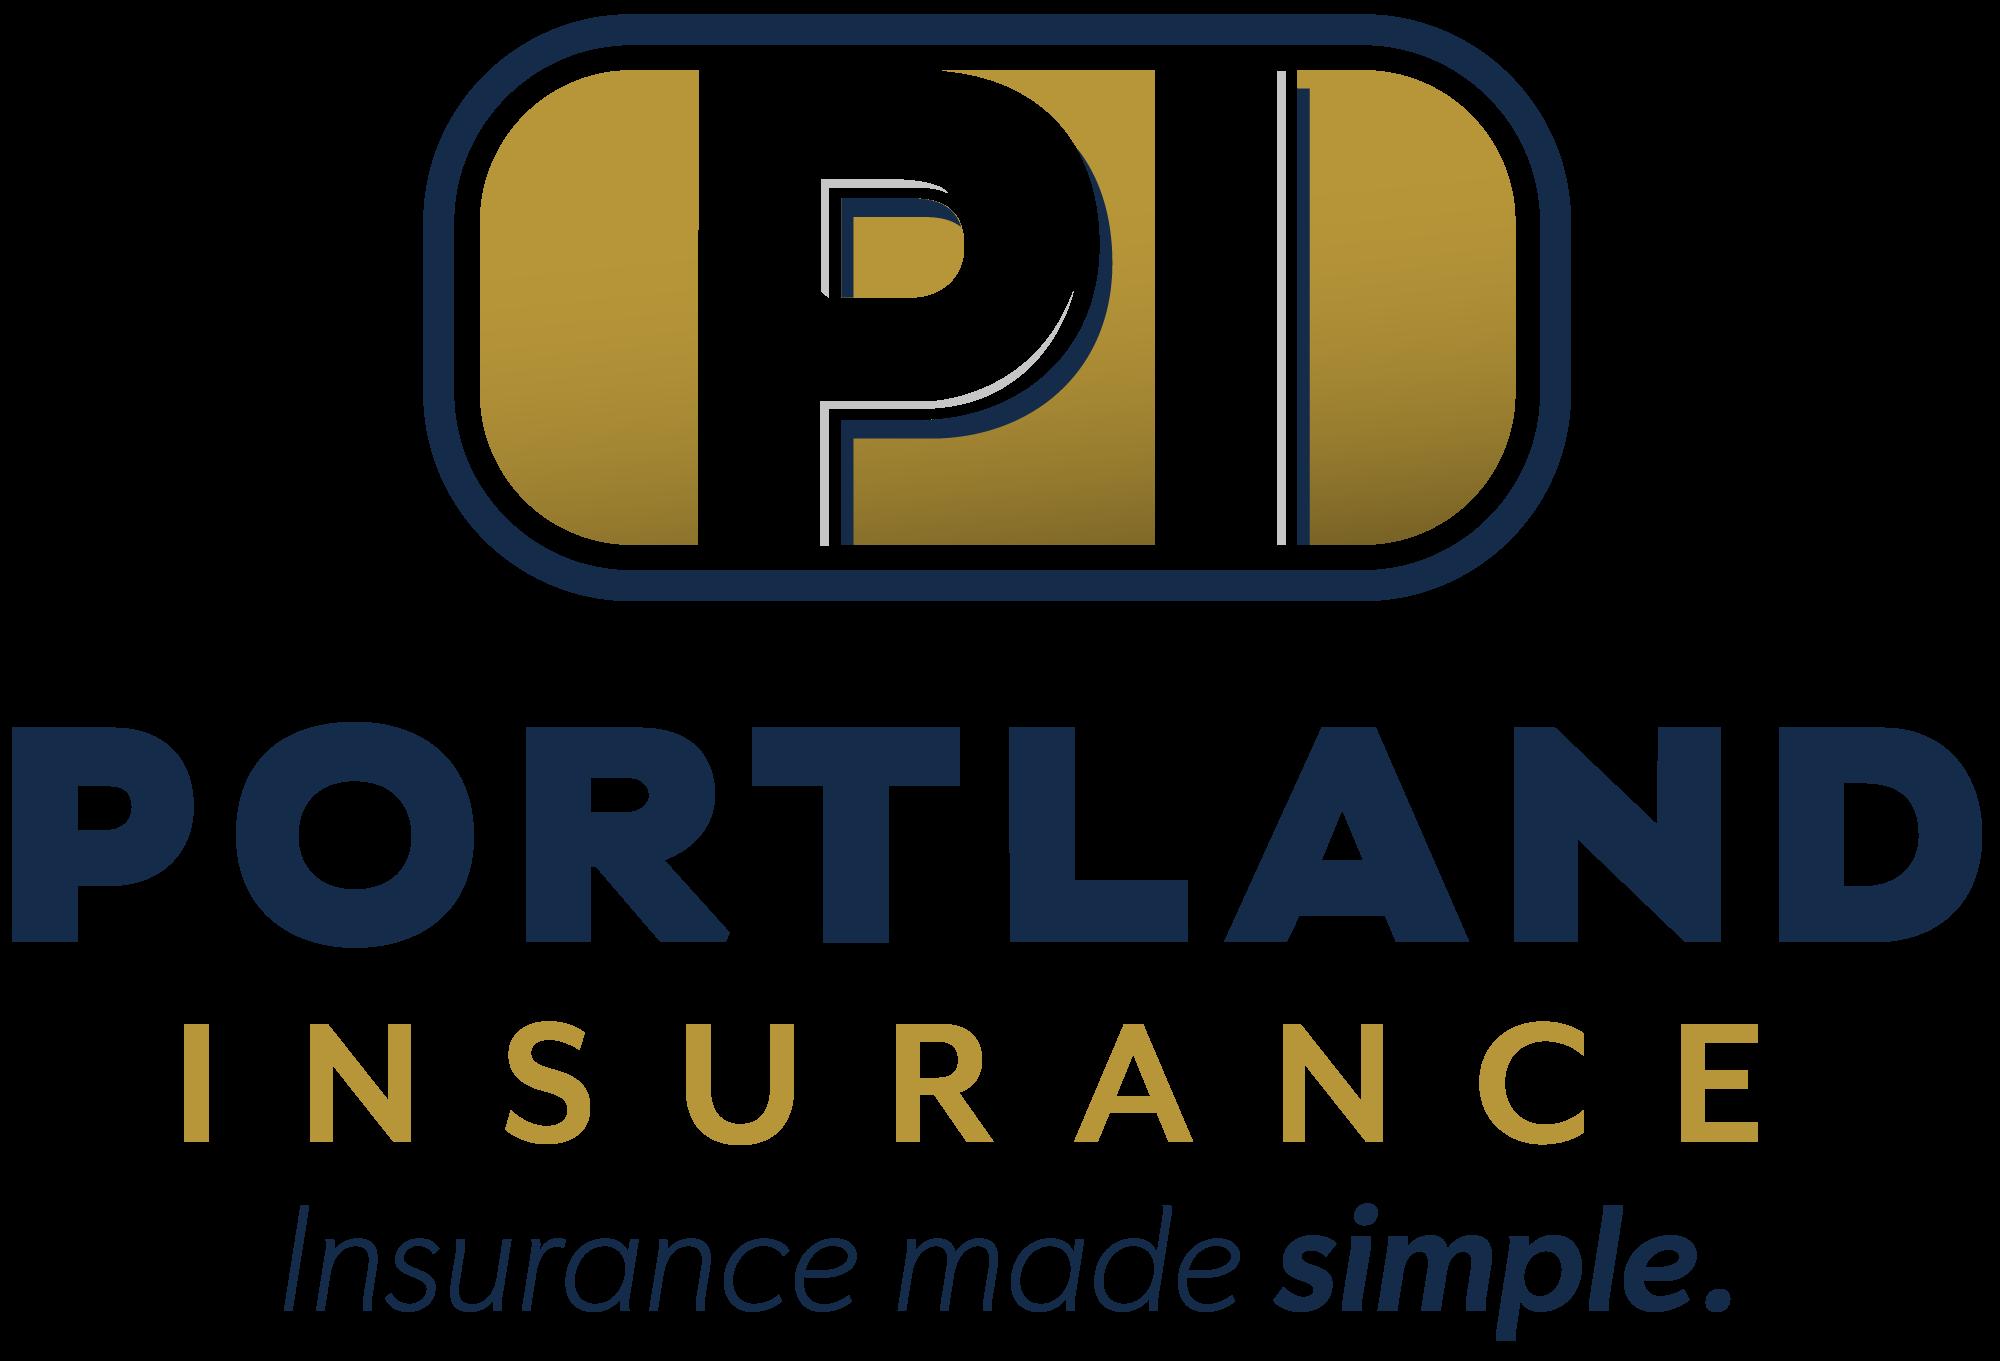 Portland Insurance Agency Home, Life, Auto & Business Insurance Portland, IN